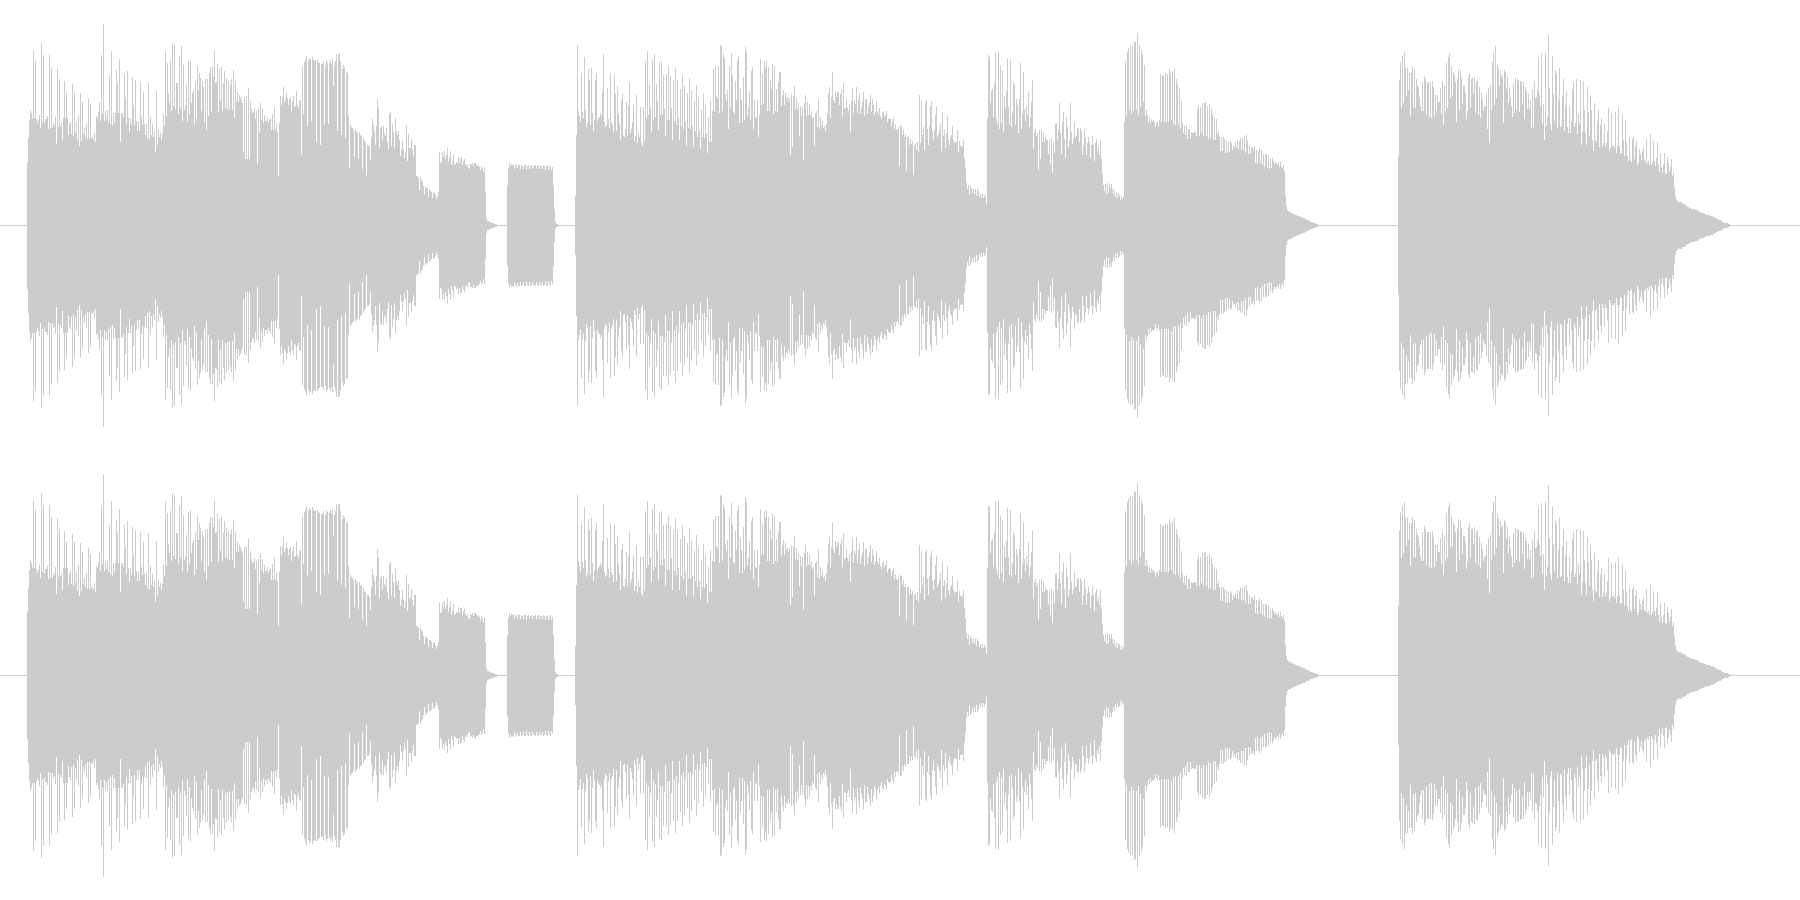 NES STG B04-2(クリア1)の未再生の波形